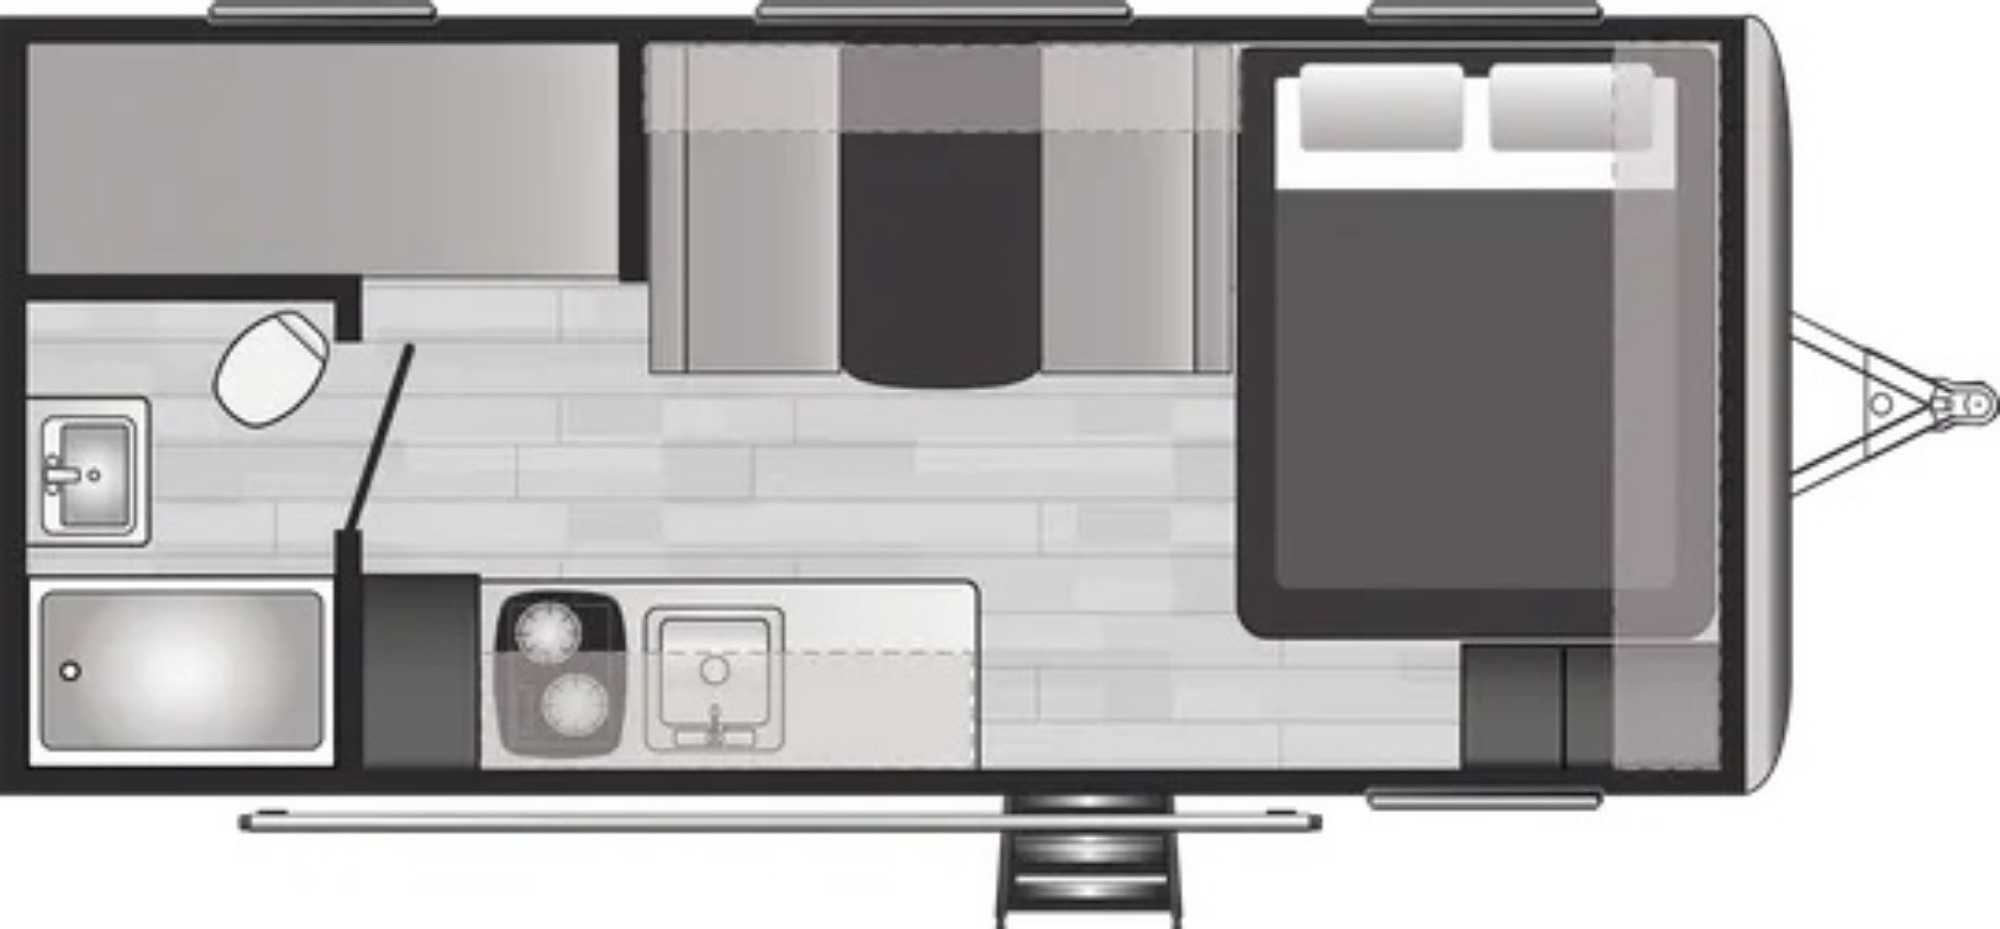 View Floor Plan for 2022 KEYSTONE SPRINGDALE 1800BH